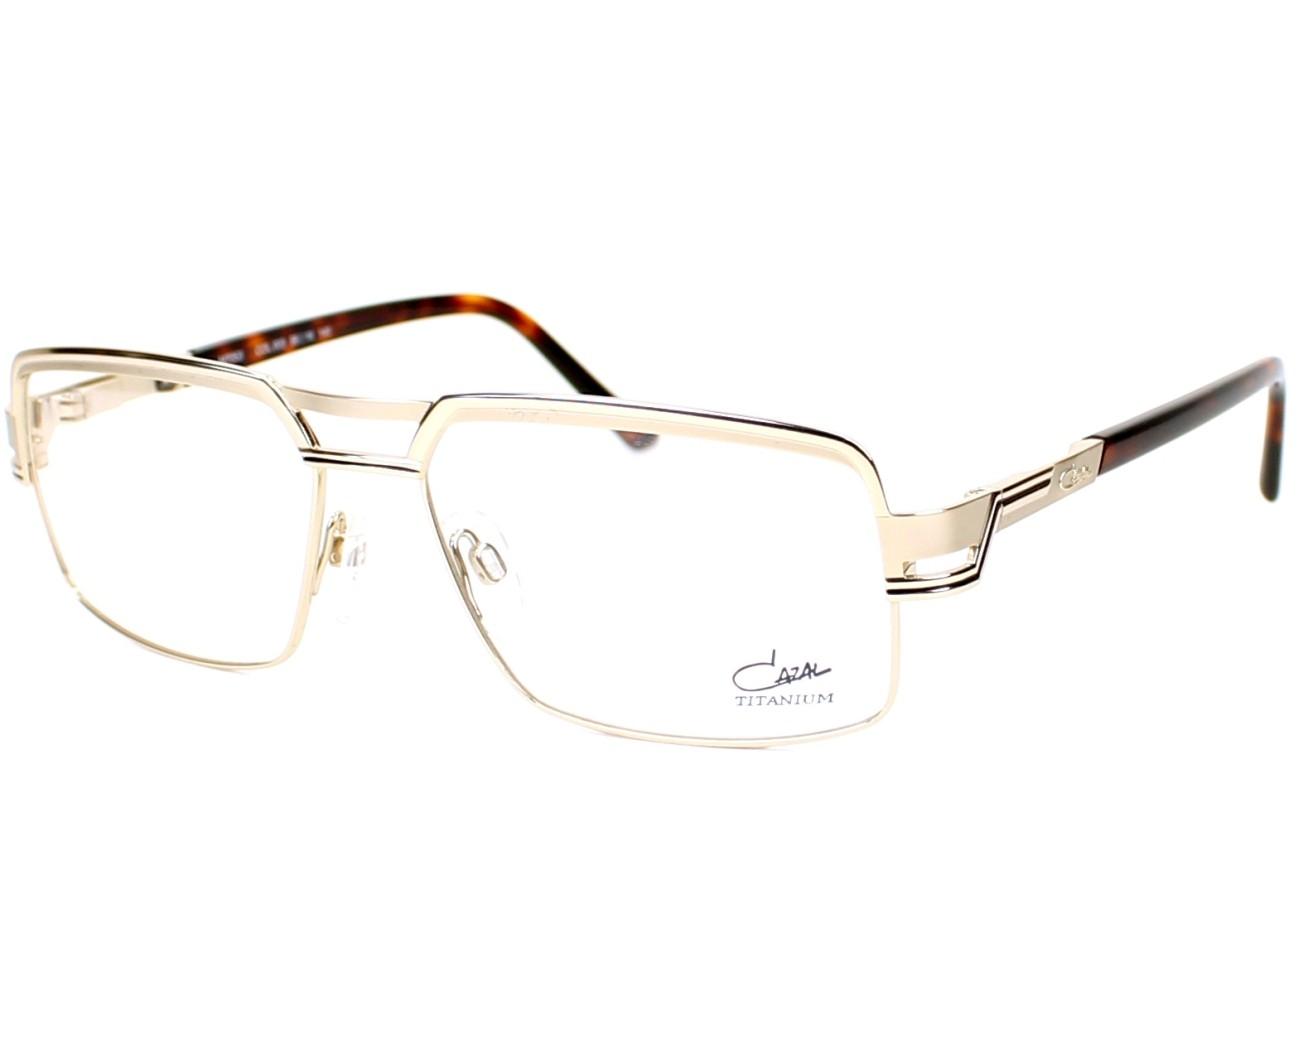 c3879e0e71b3 eyeglasses Cazal 7053 003 - Gold Gold profile view